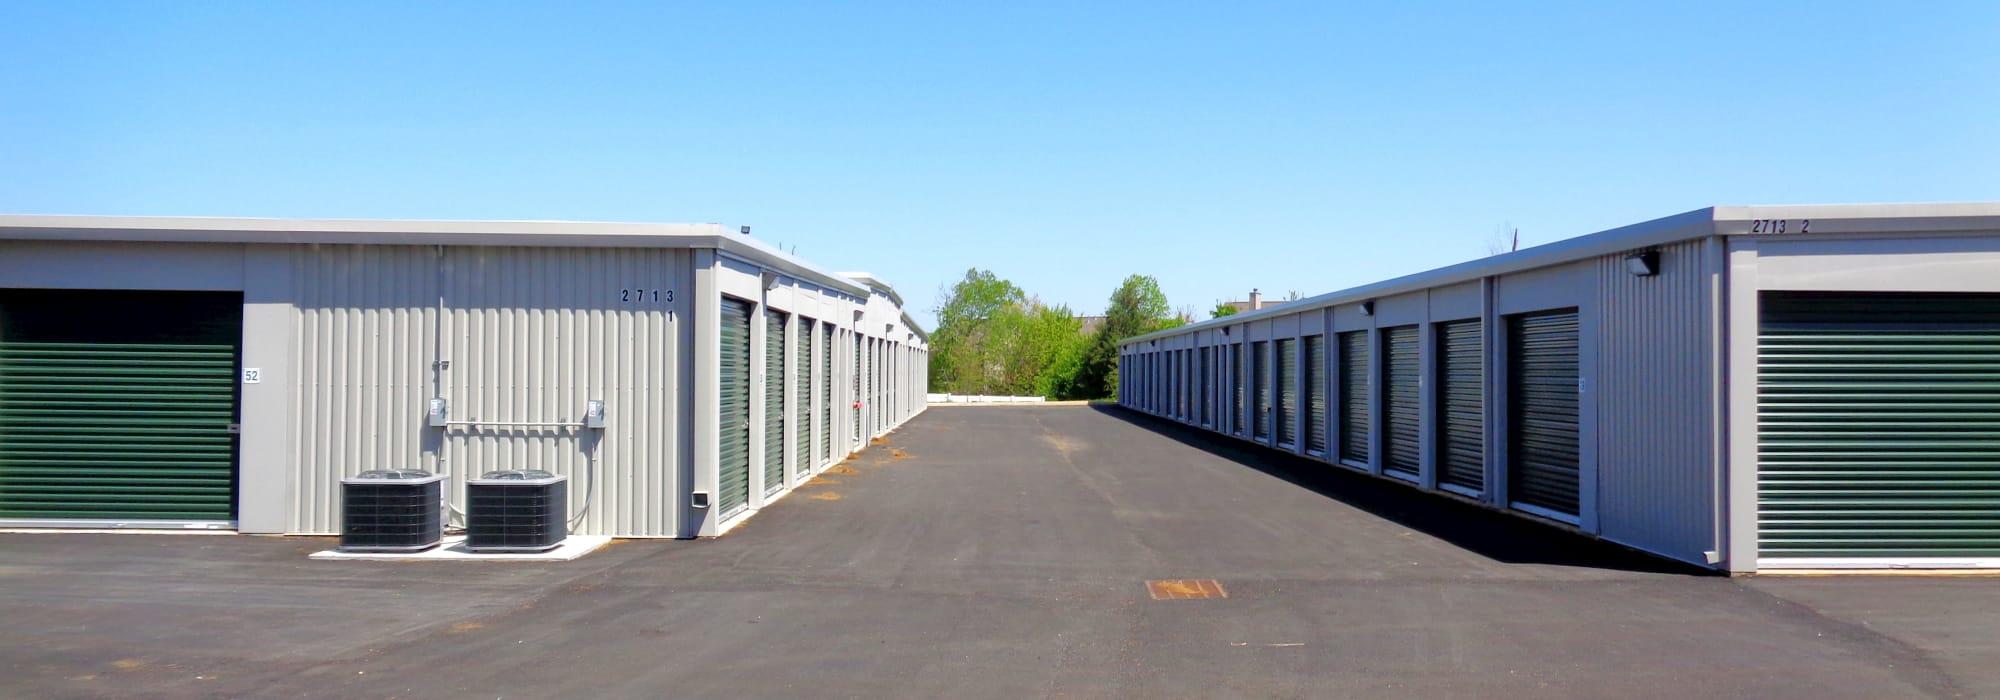 Prime Storage in Simpsonville, SC